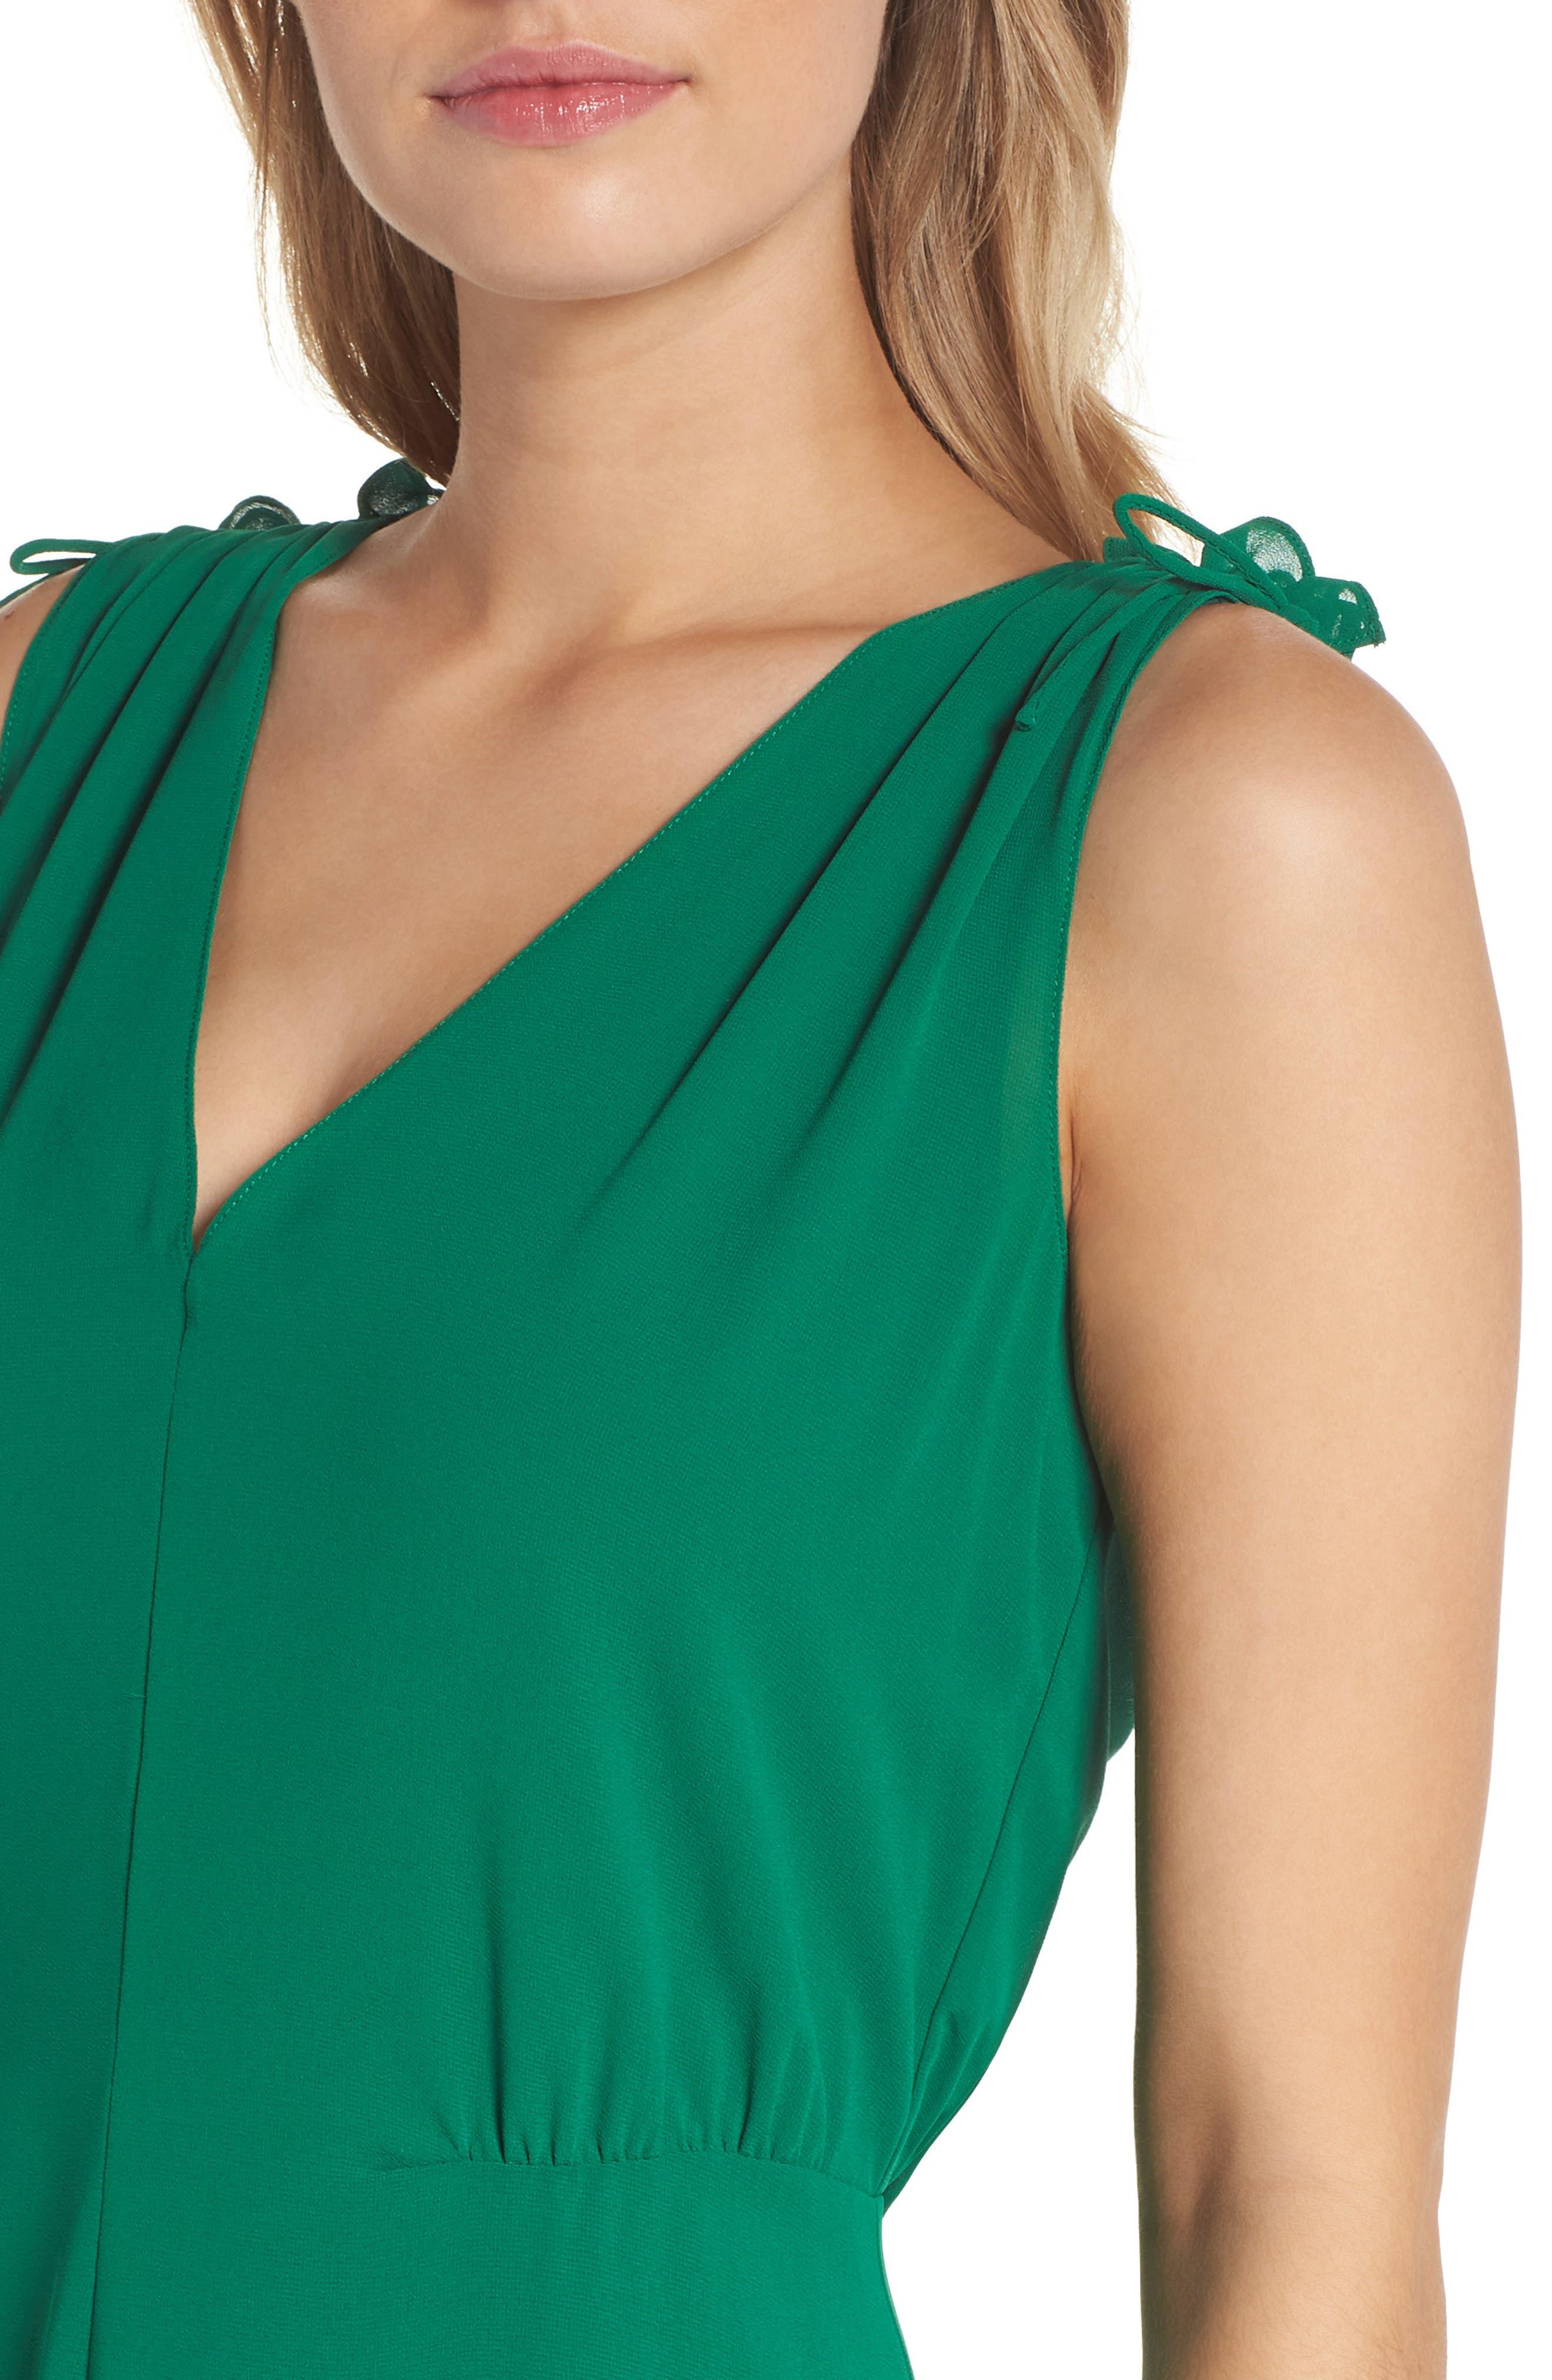 Soufflé V-Neck Chiffon Dress,                             Alternate thumbnail 4, color,                             310